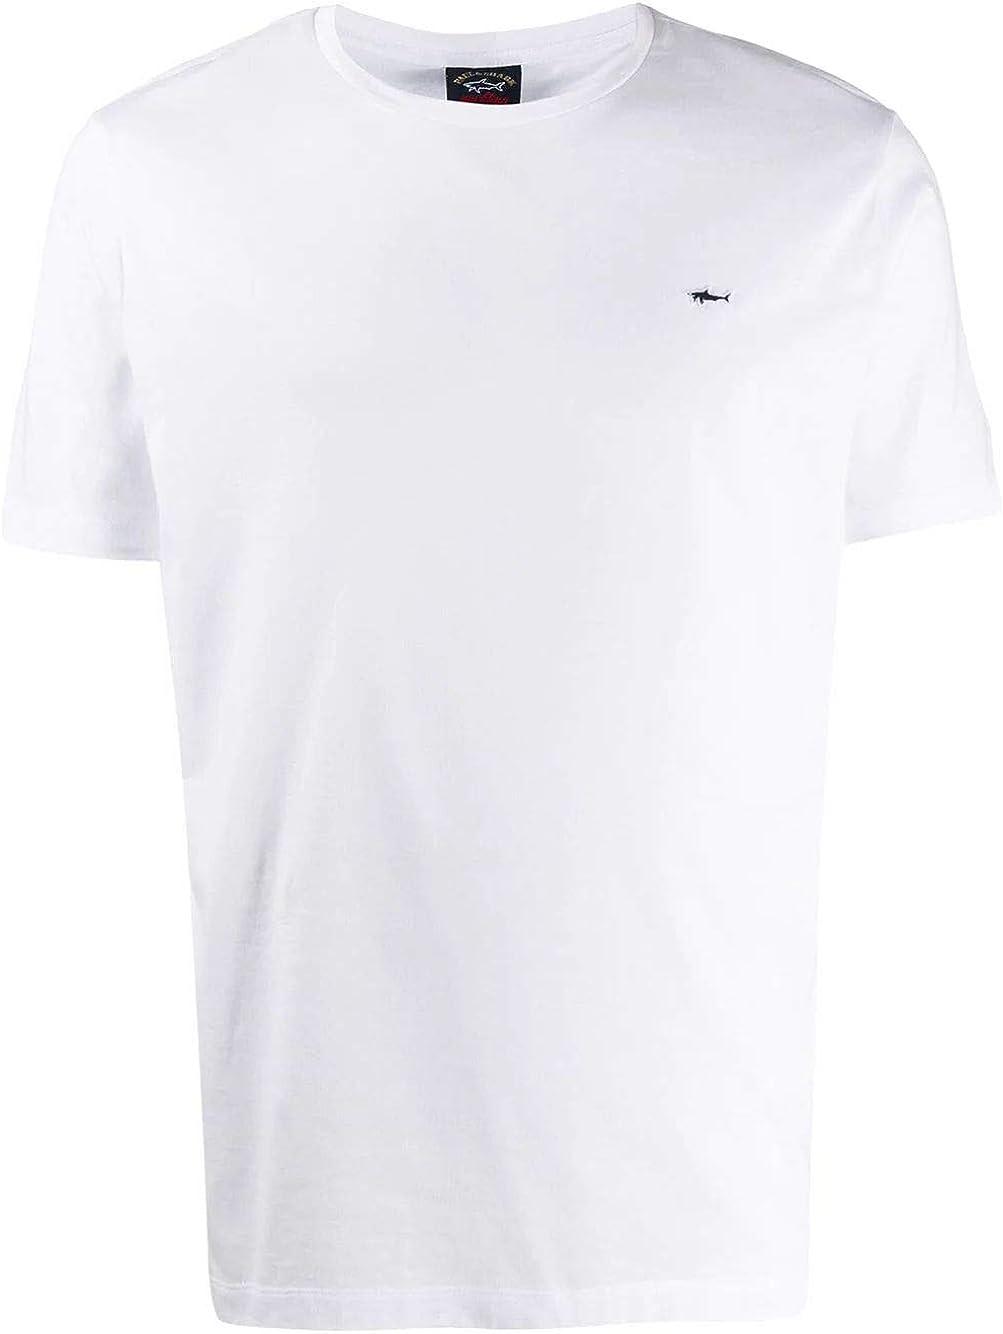 PAUL & SHARK Luxury Fashion Man E20P1074010 White Cotton T-Shirt | Spring Summer 20